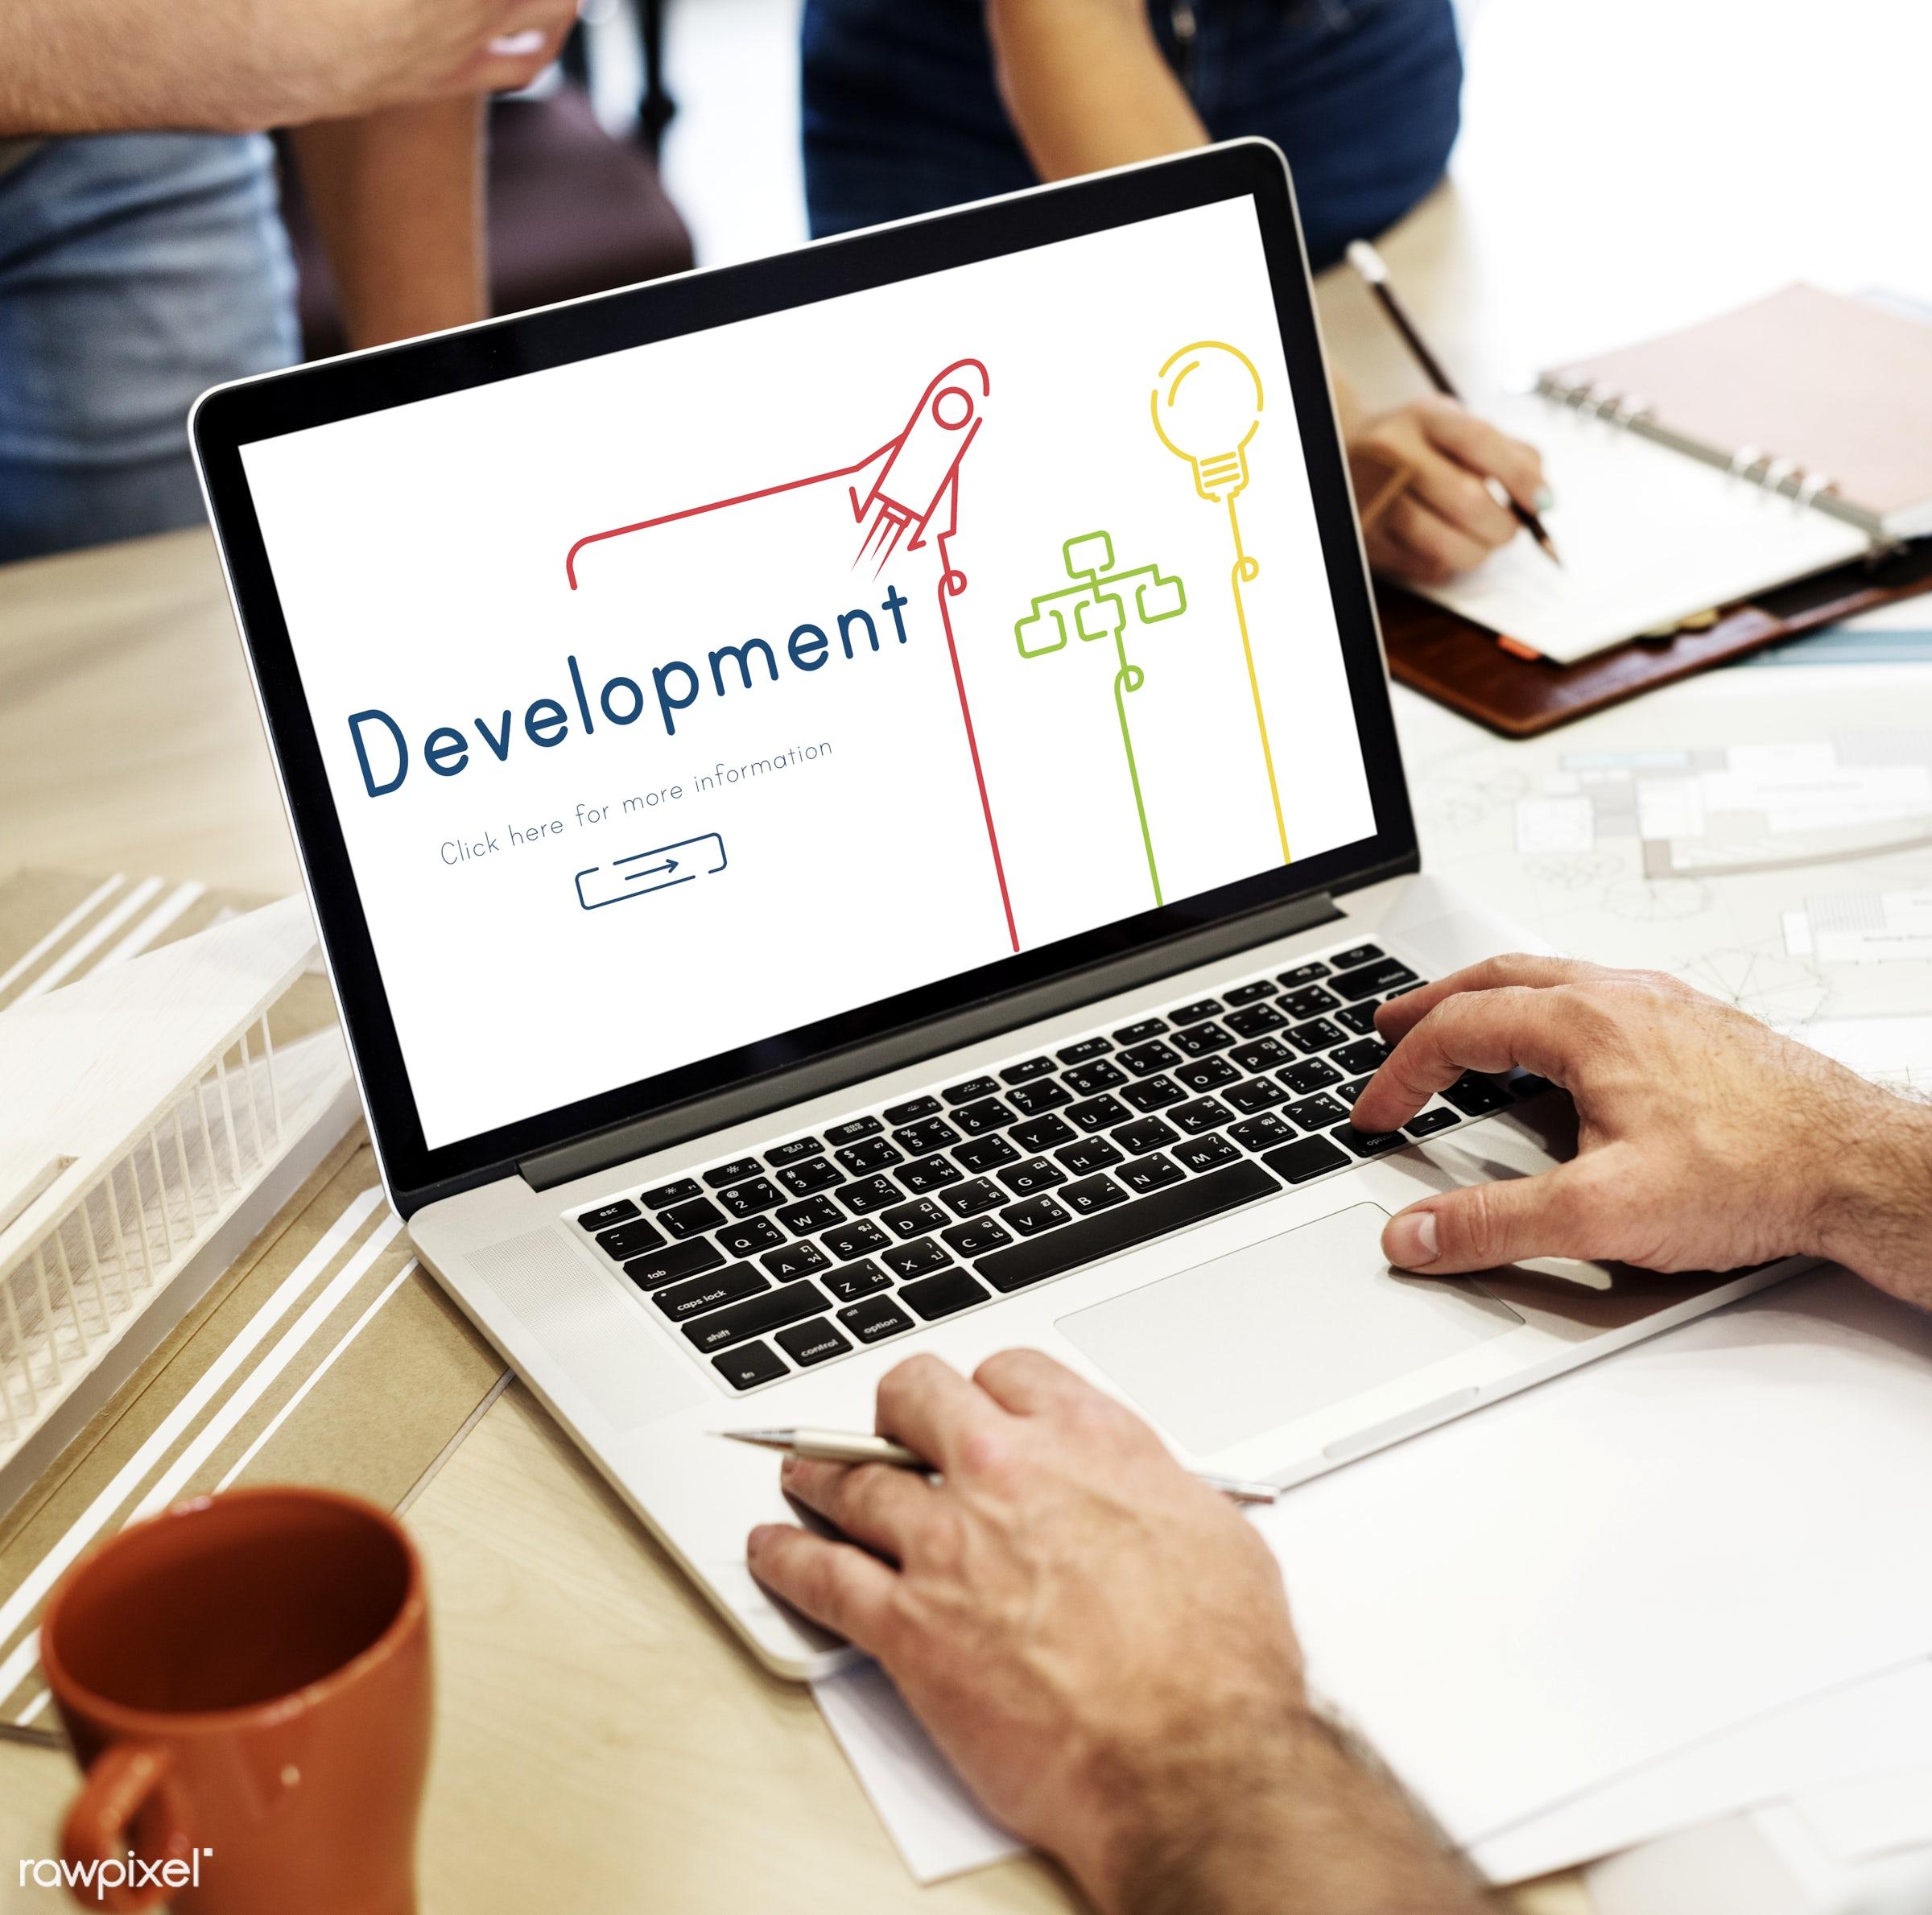 architect, architecture, art, blueprint, business, change, coffee, coffee cup, cup, design, development, device, digital...